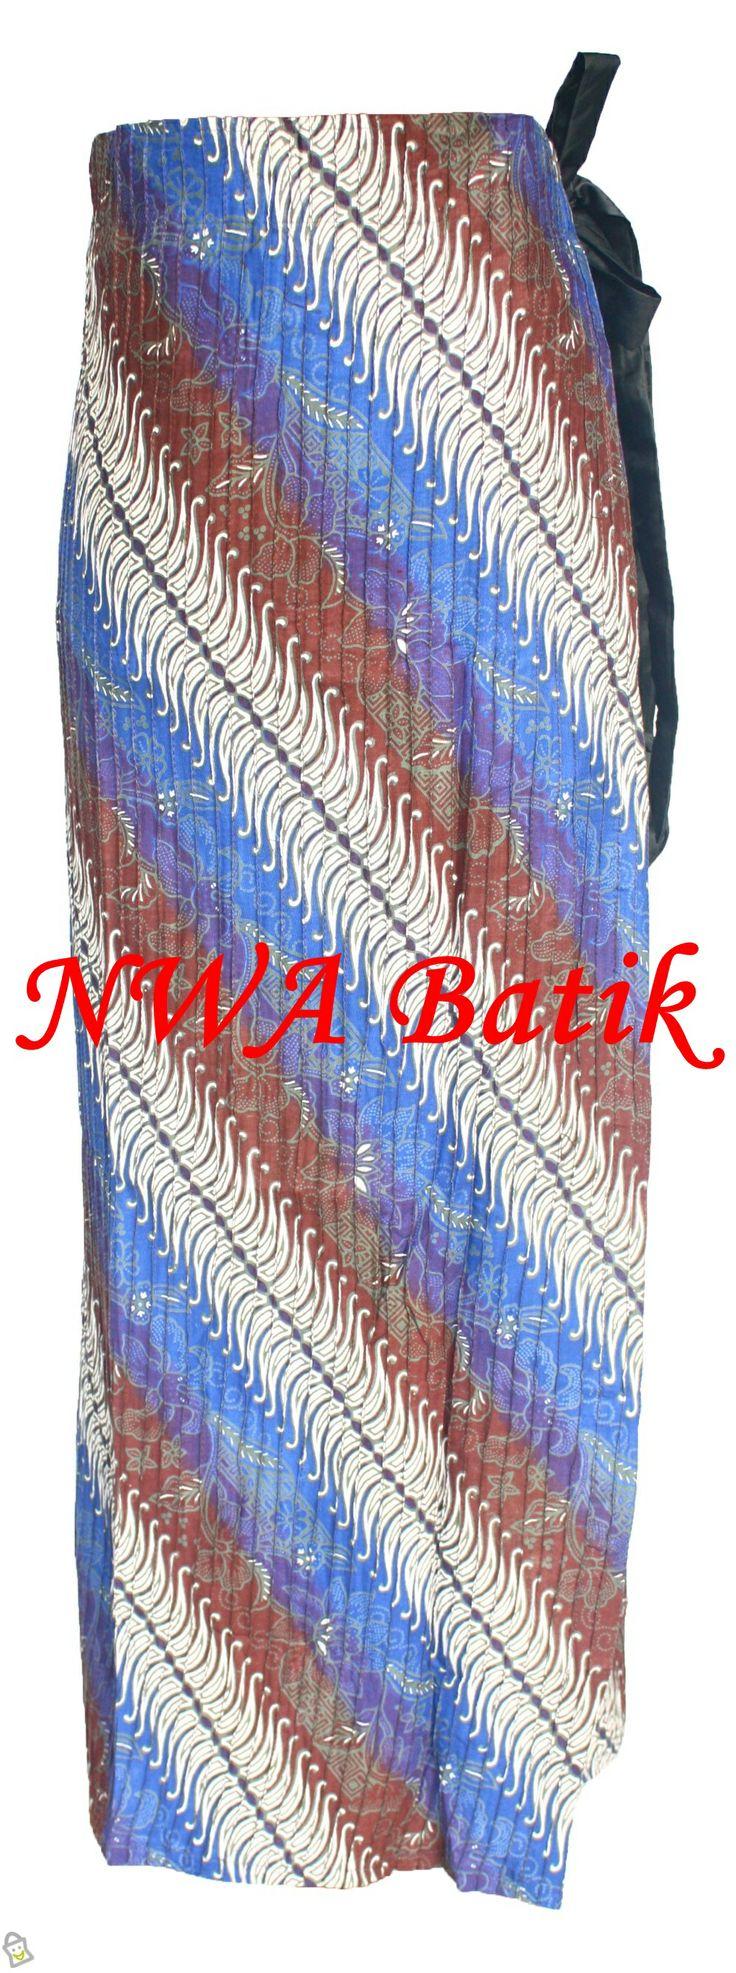 biru idr batik lilit idr 150 batik skirt 150 000 things to wear ...